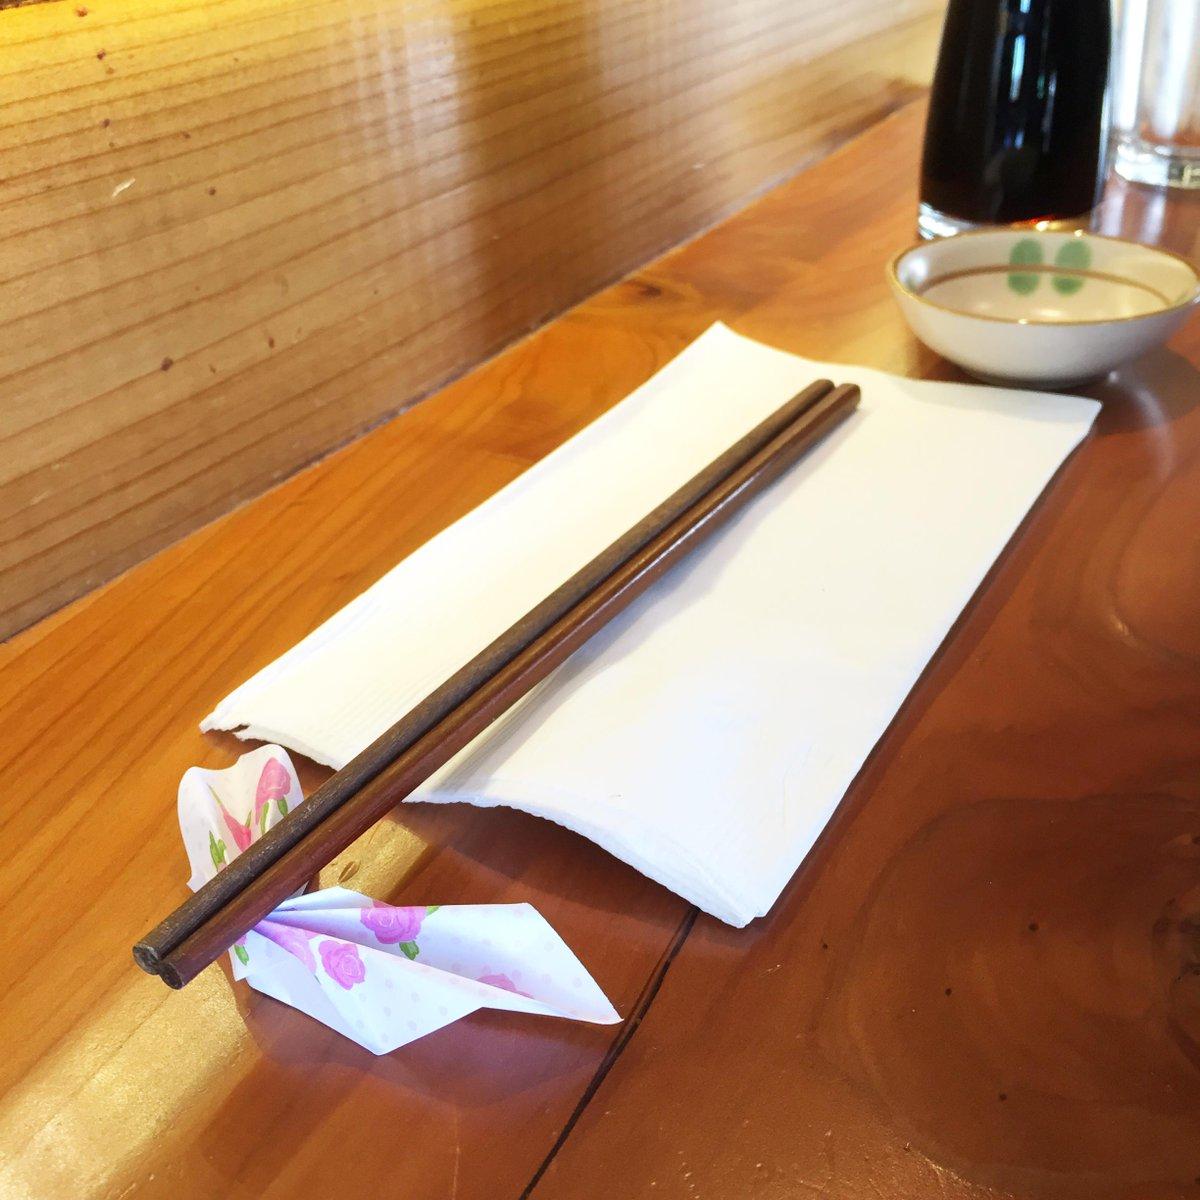 Japanese Foodie On Twitter Origami Chopstick Holder At Kamado